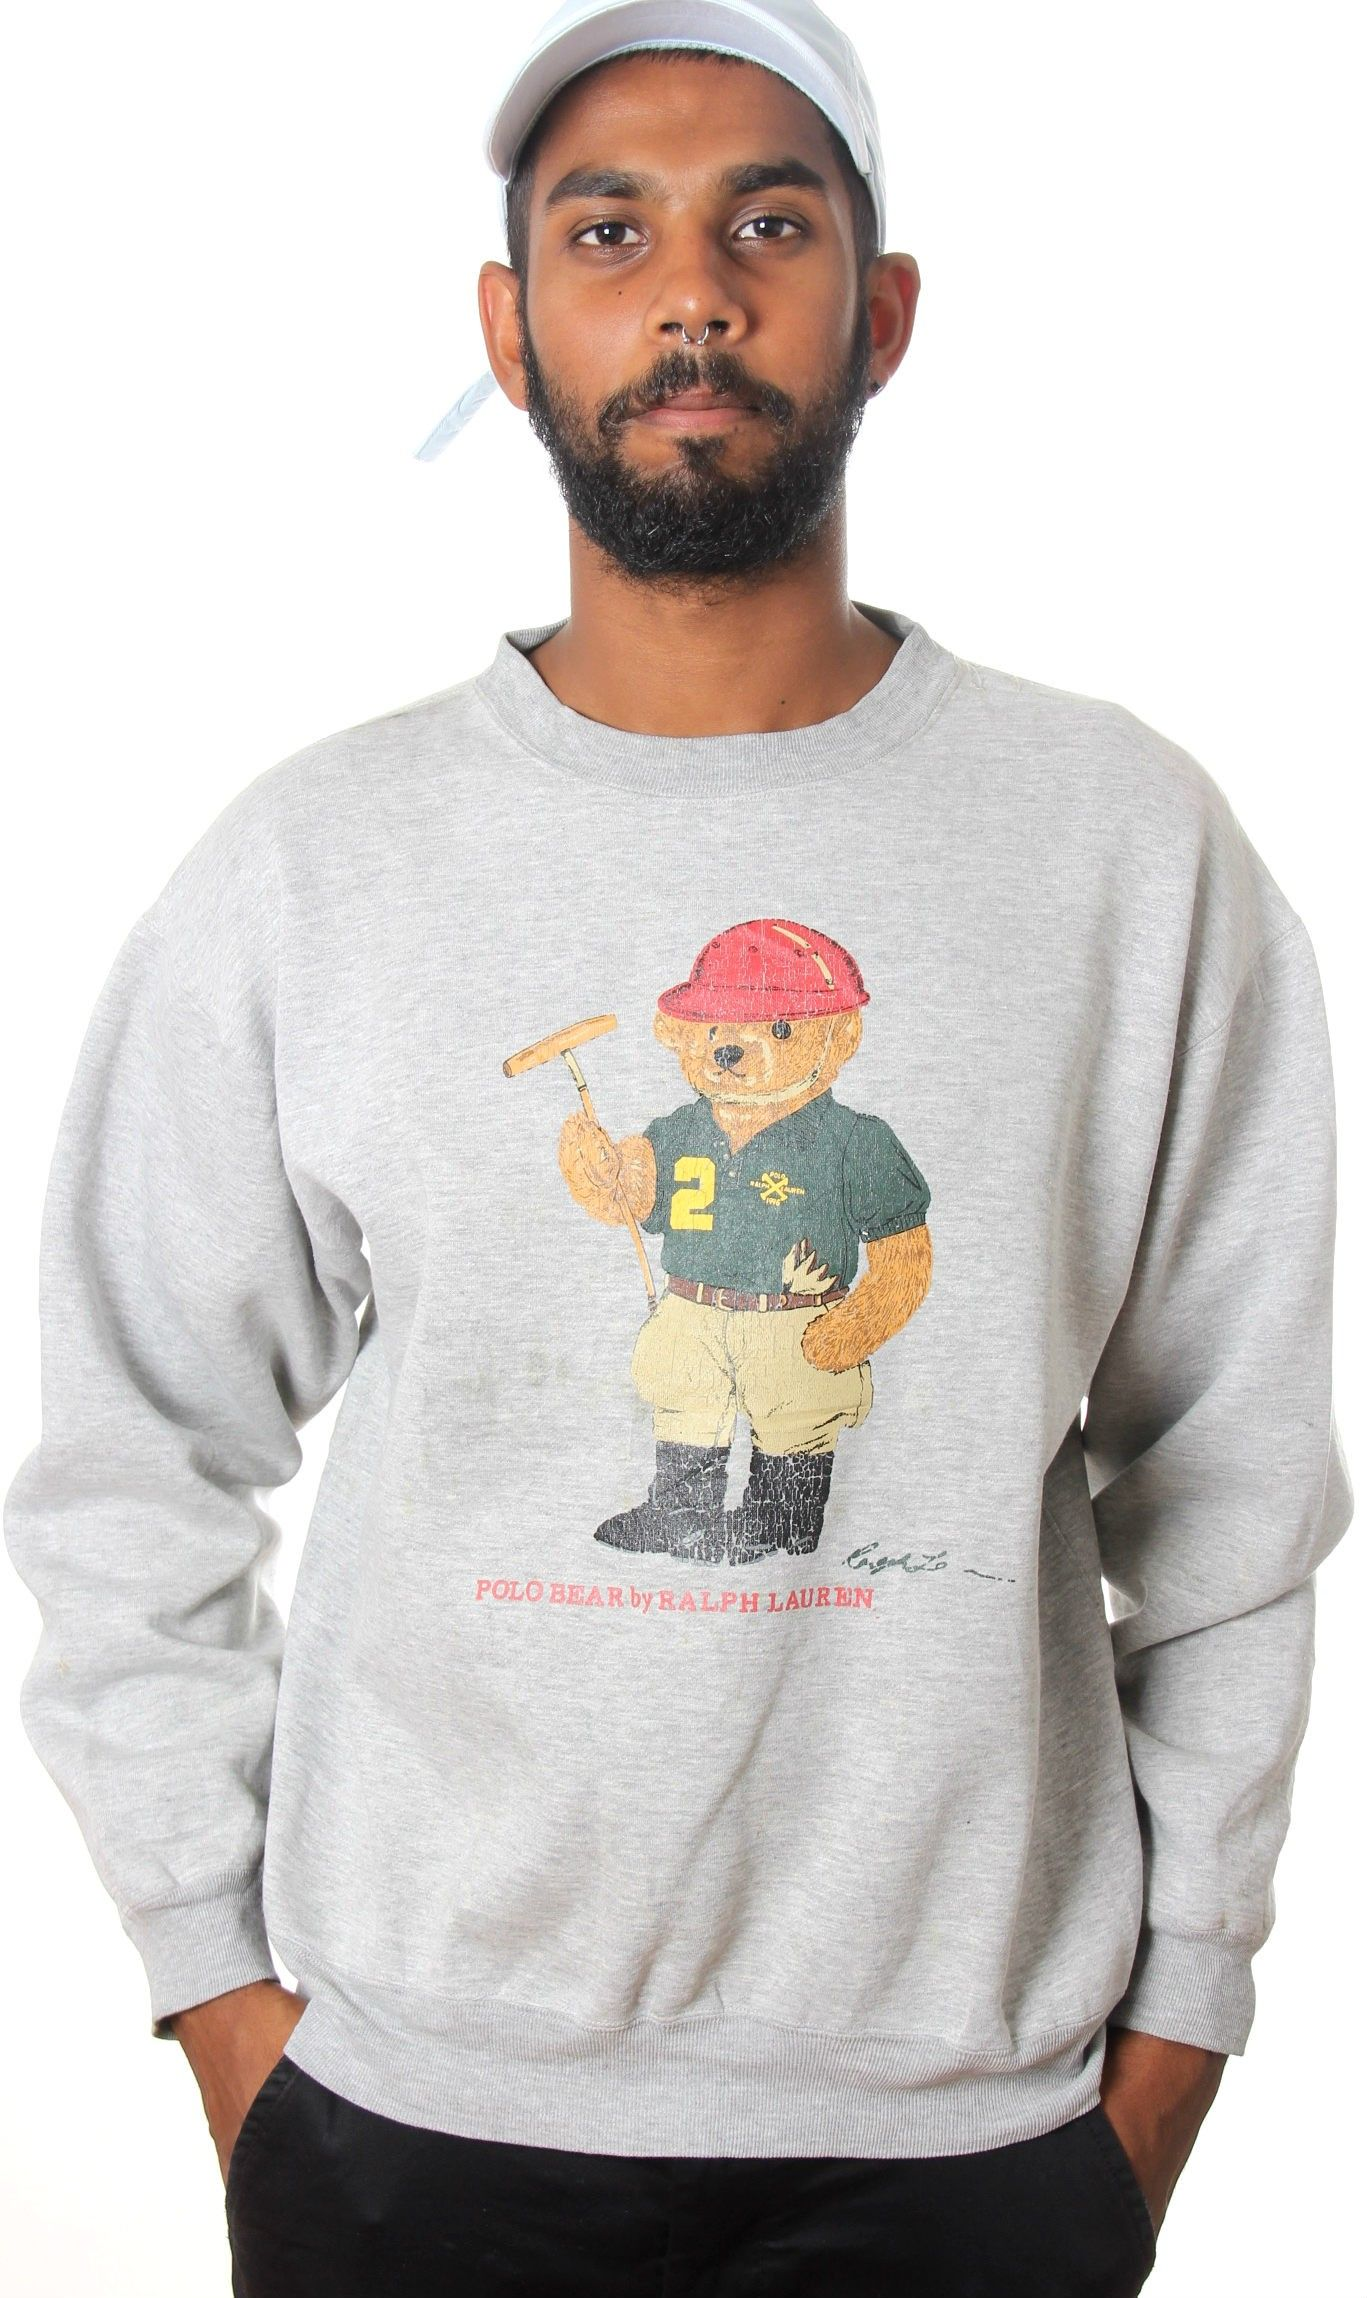 8b9cc9a16ed Mens Ralph Lauren Polo Shirt With Bear Logo - SIS Solutions